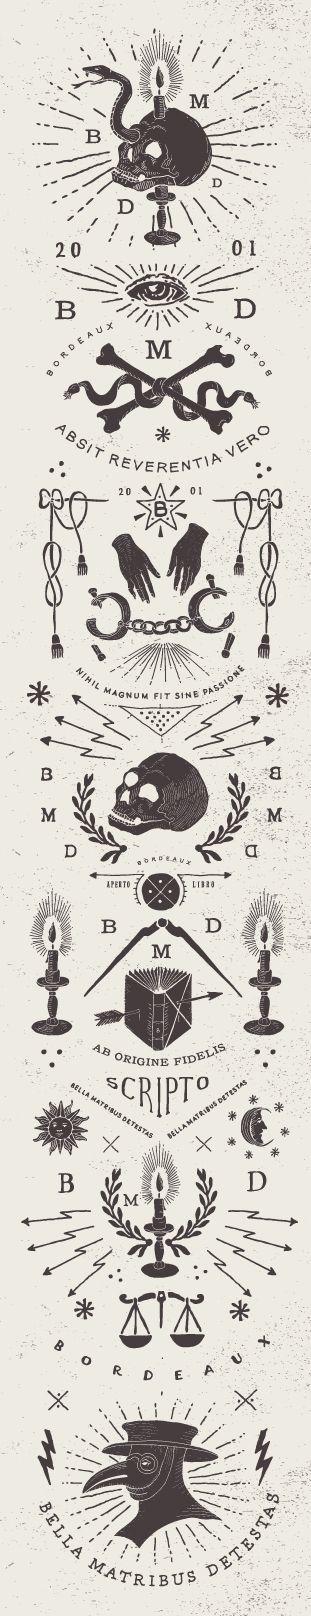 BMD Design / Bella Matribus Detestas